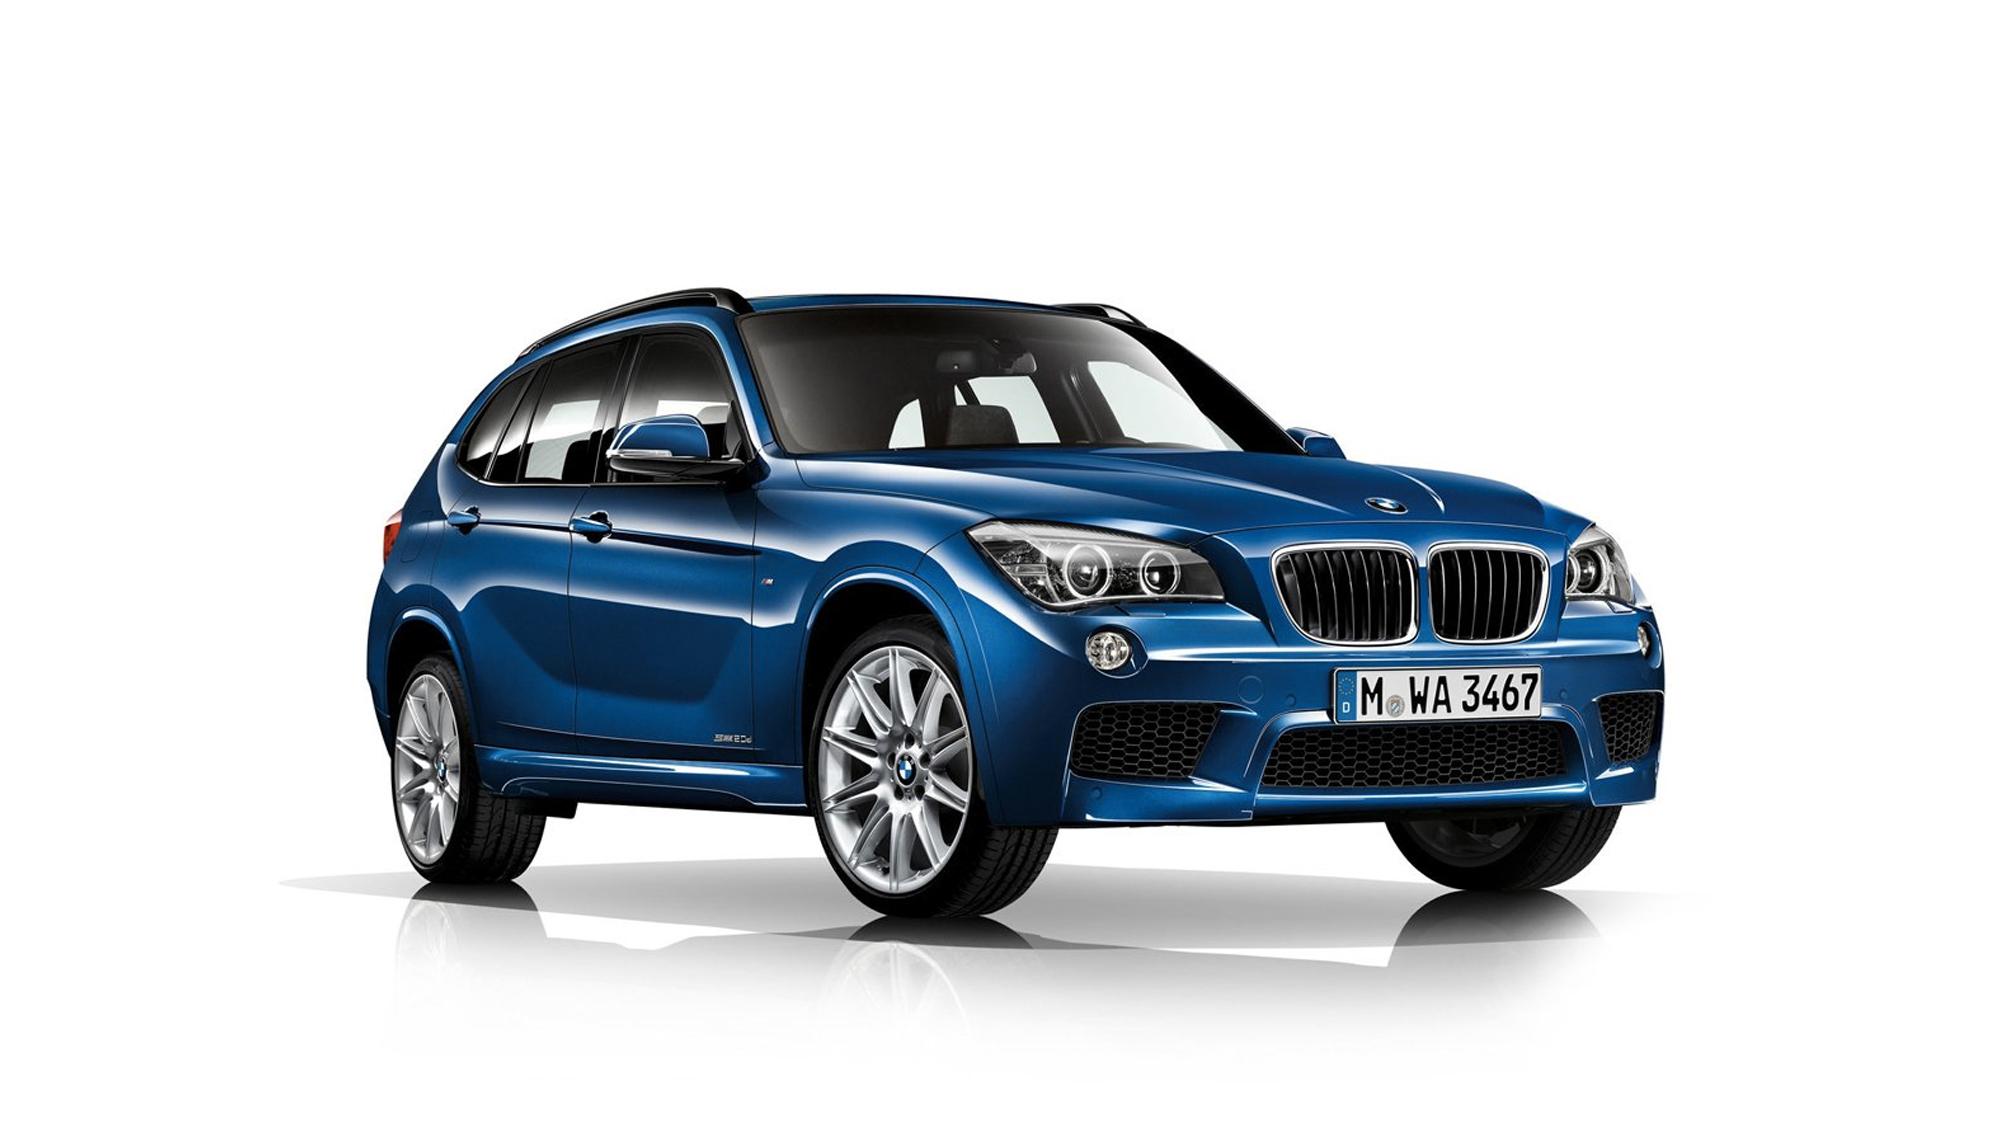 Noleggio lungo termine BMW X2 sDrive